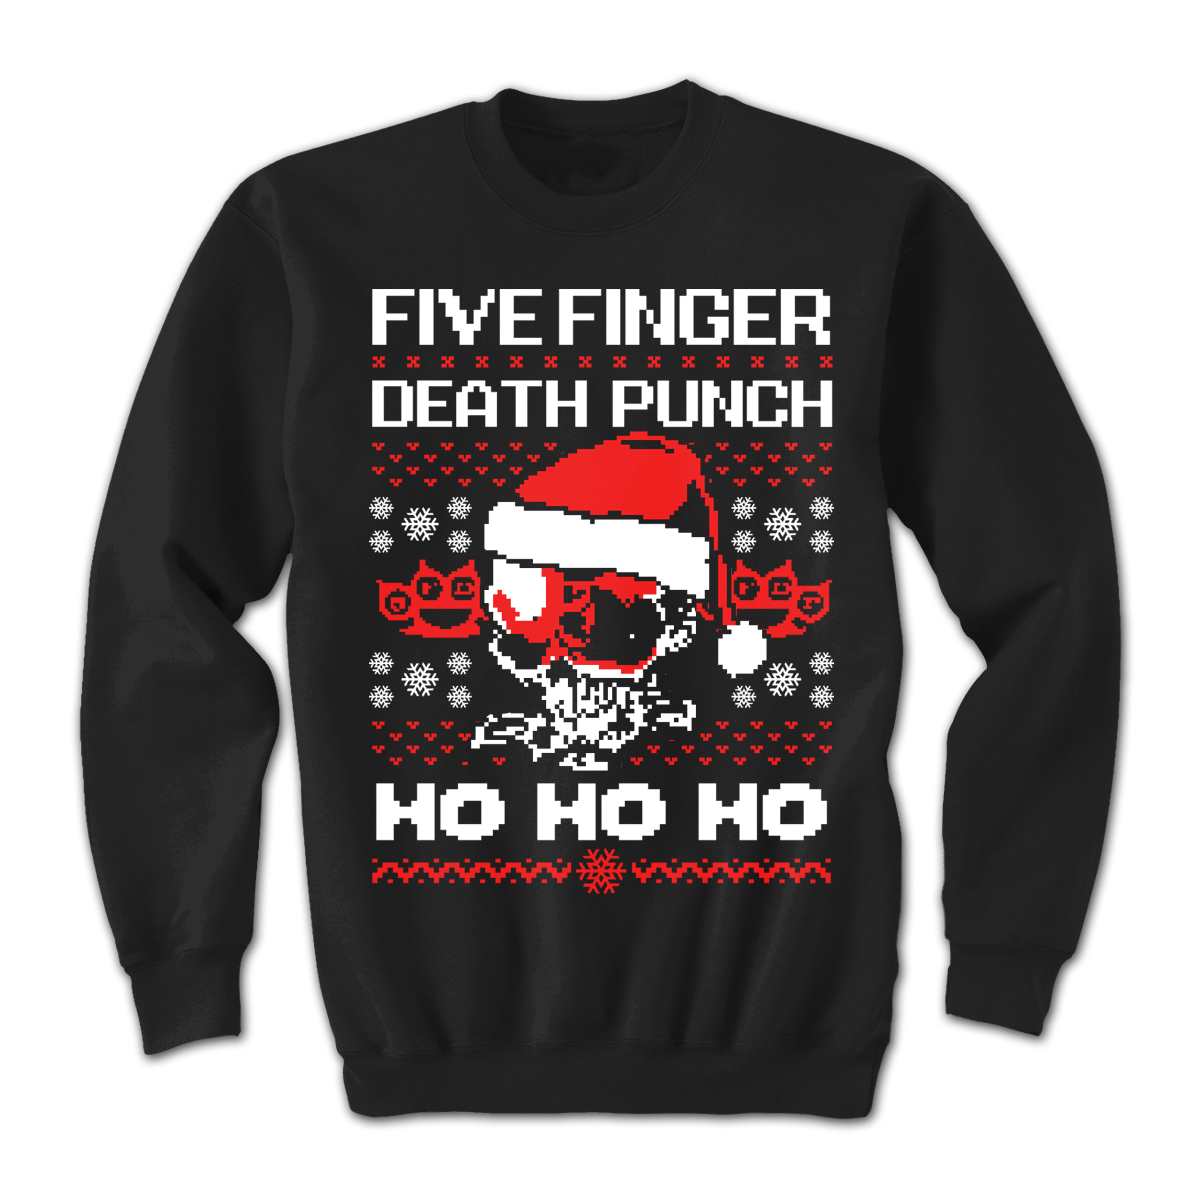 Five Finger Death Punch T-Shirts | Five Finger Death Punch Got